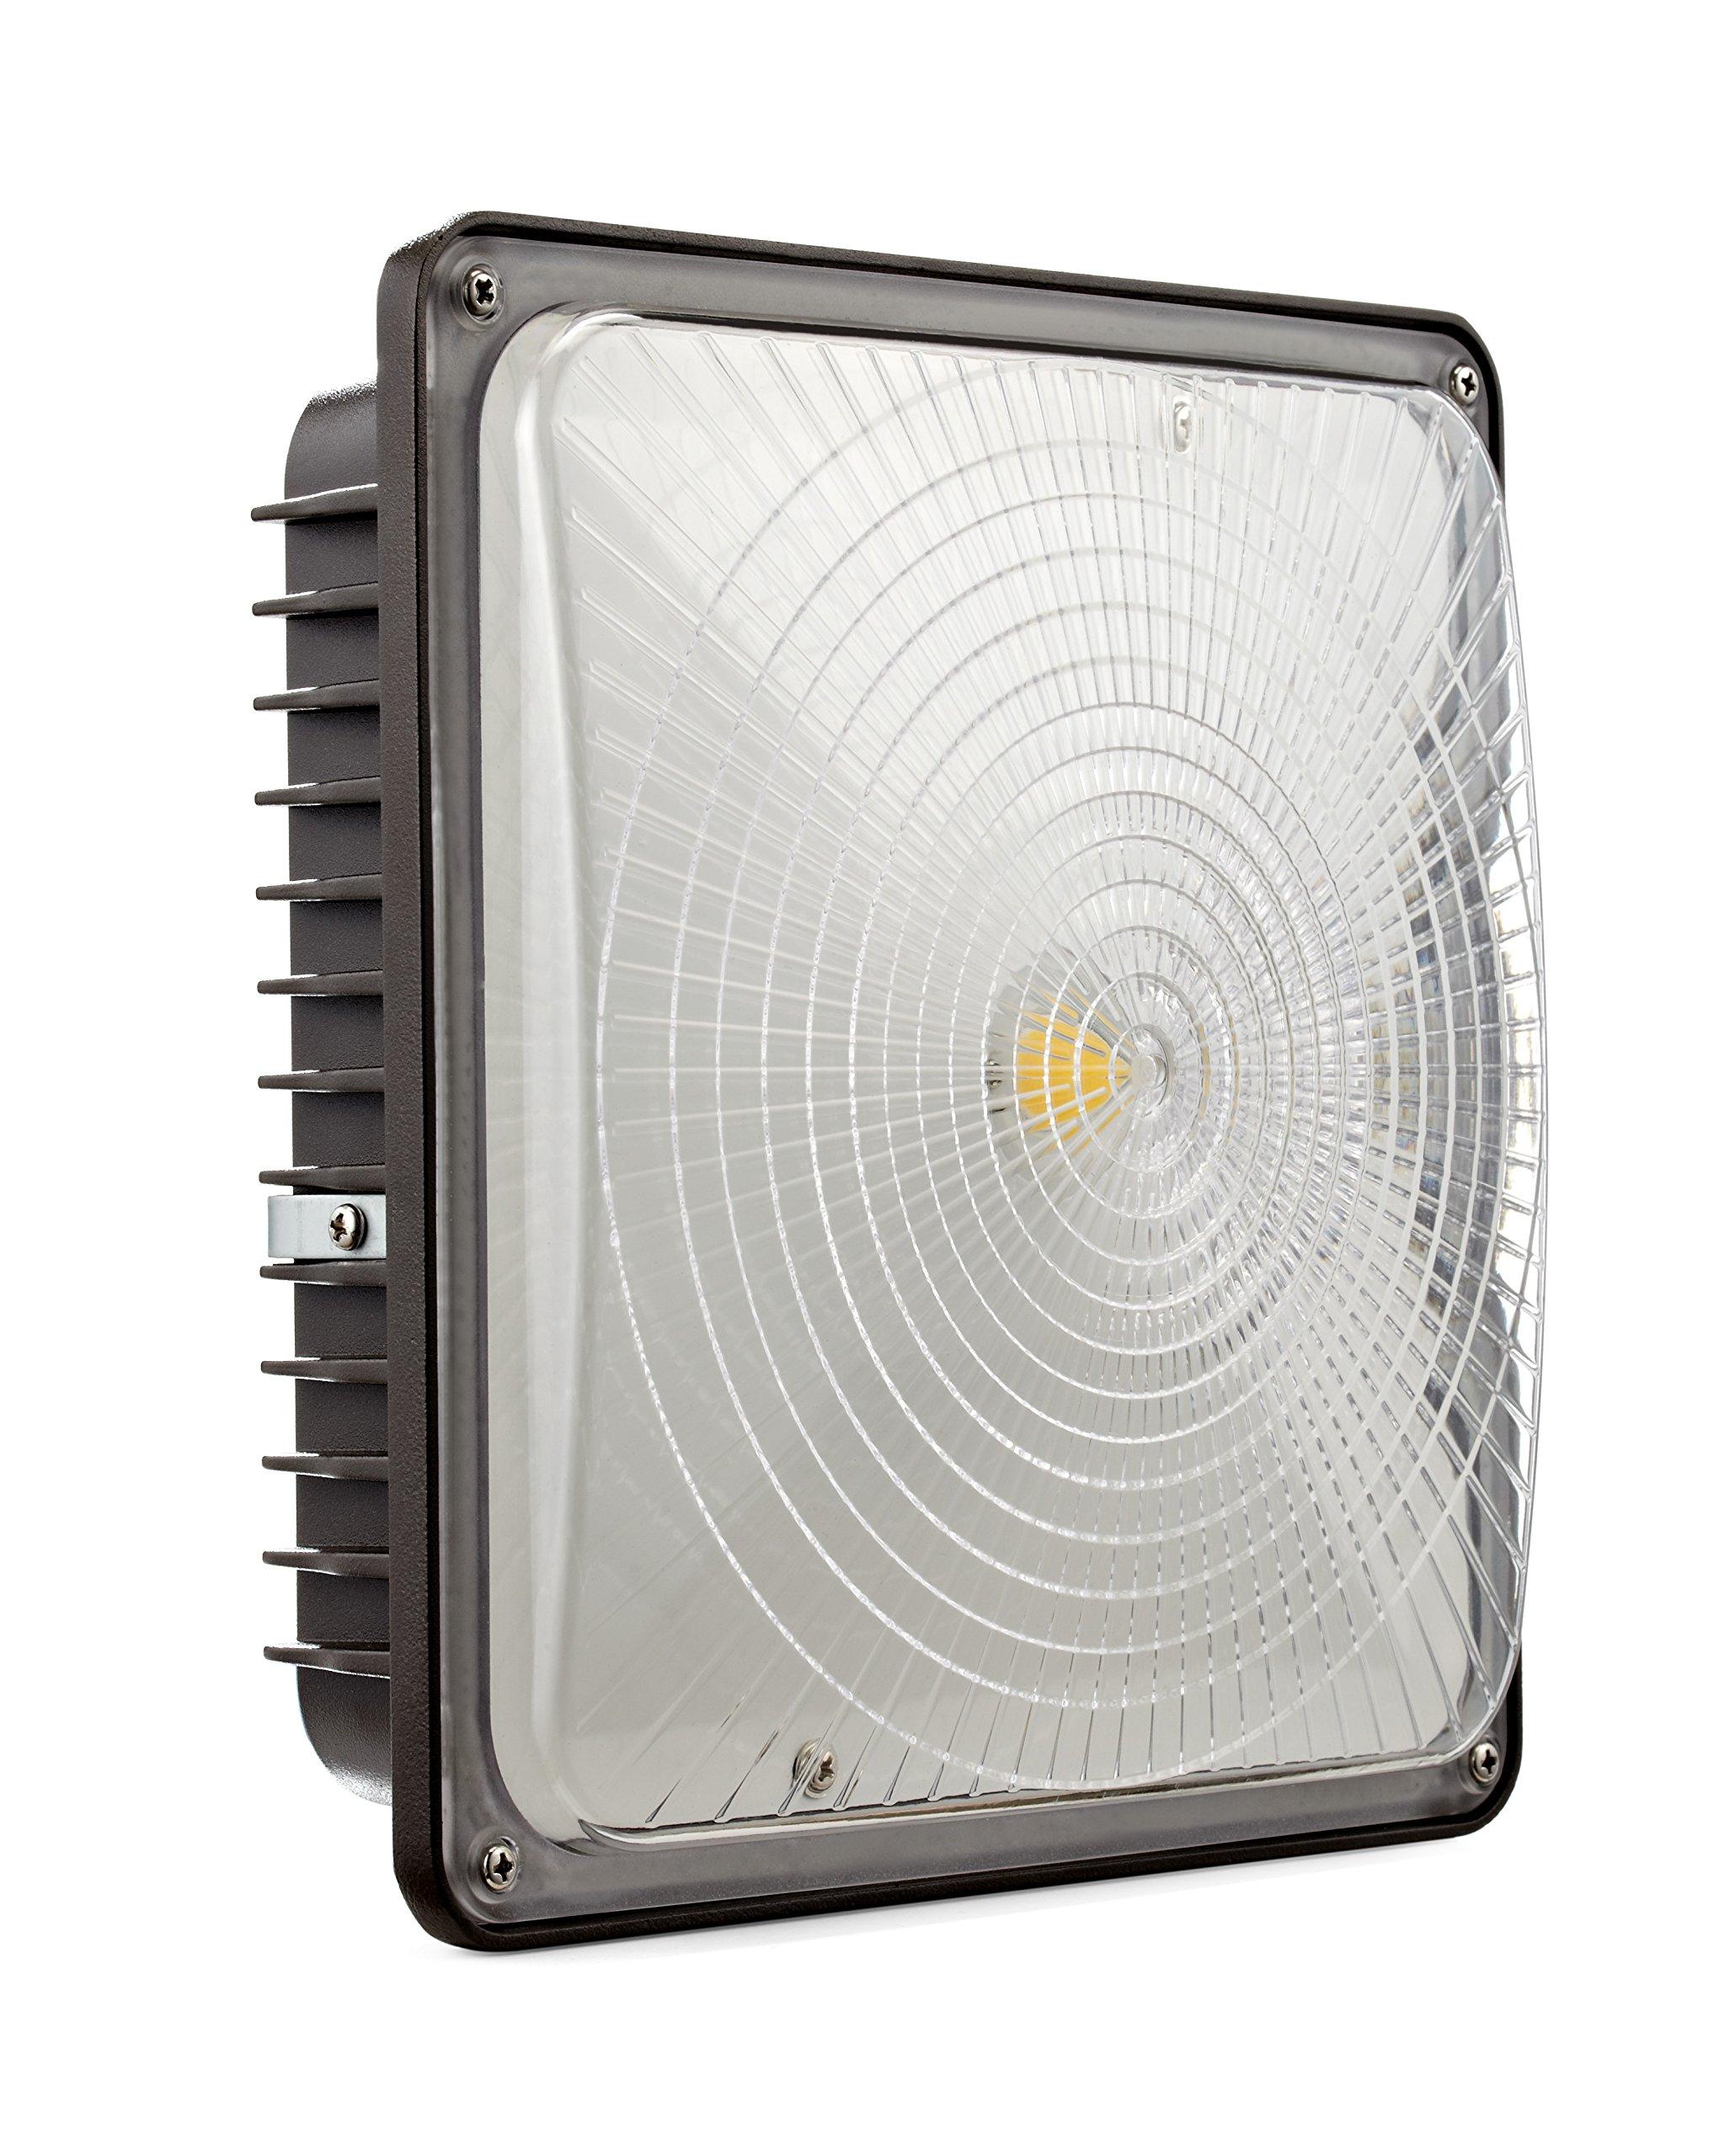 D-Lites 45W LED Canopy Fixture, 5000K, Dark Bronze, 4,200 Lumens, 0-10V Dimmable